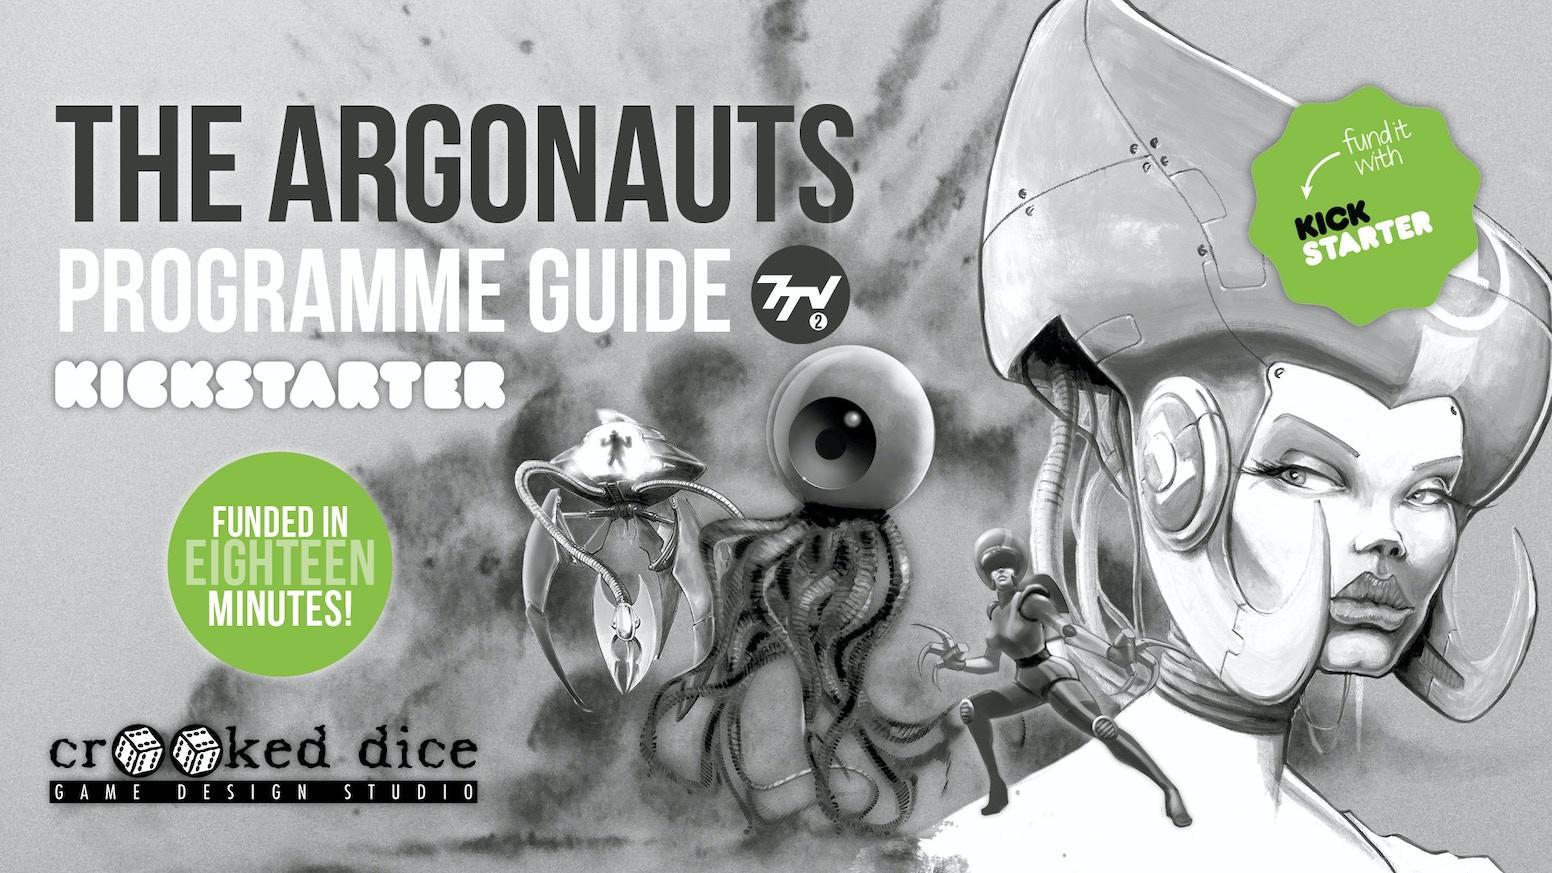 Argonauts 7tv Programme Guide Miniatures By Crooked Dice Game Design Studio It S The Final 24 Hours Kickstarter